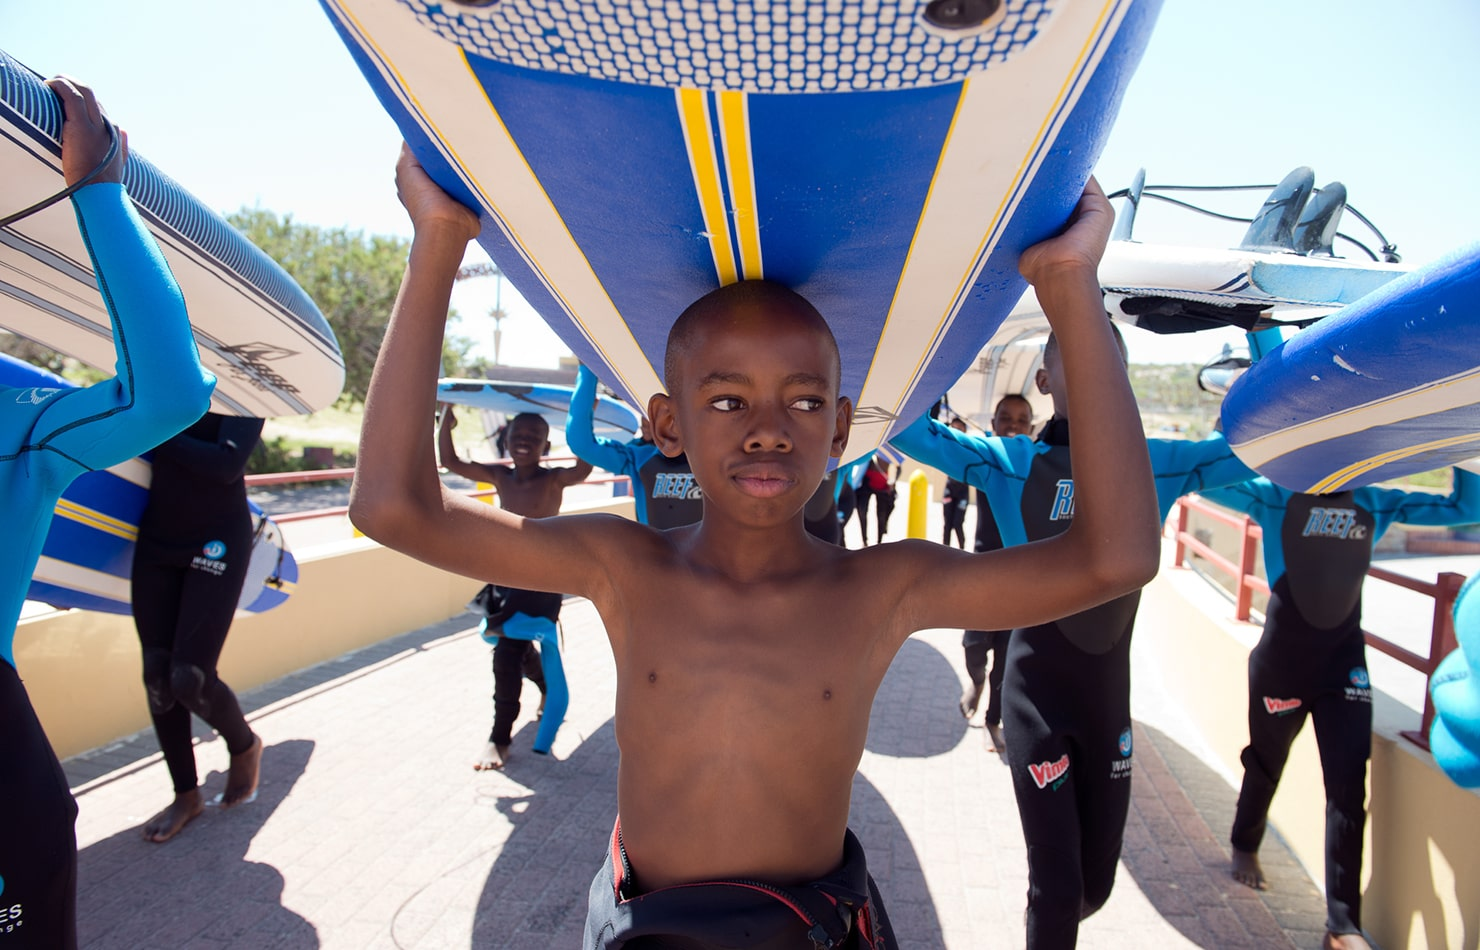 Surf στη Nότια Αφρική ενάντια στη βία